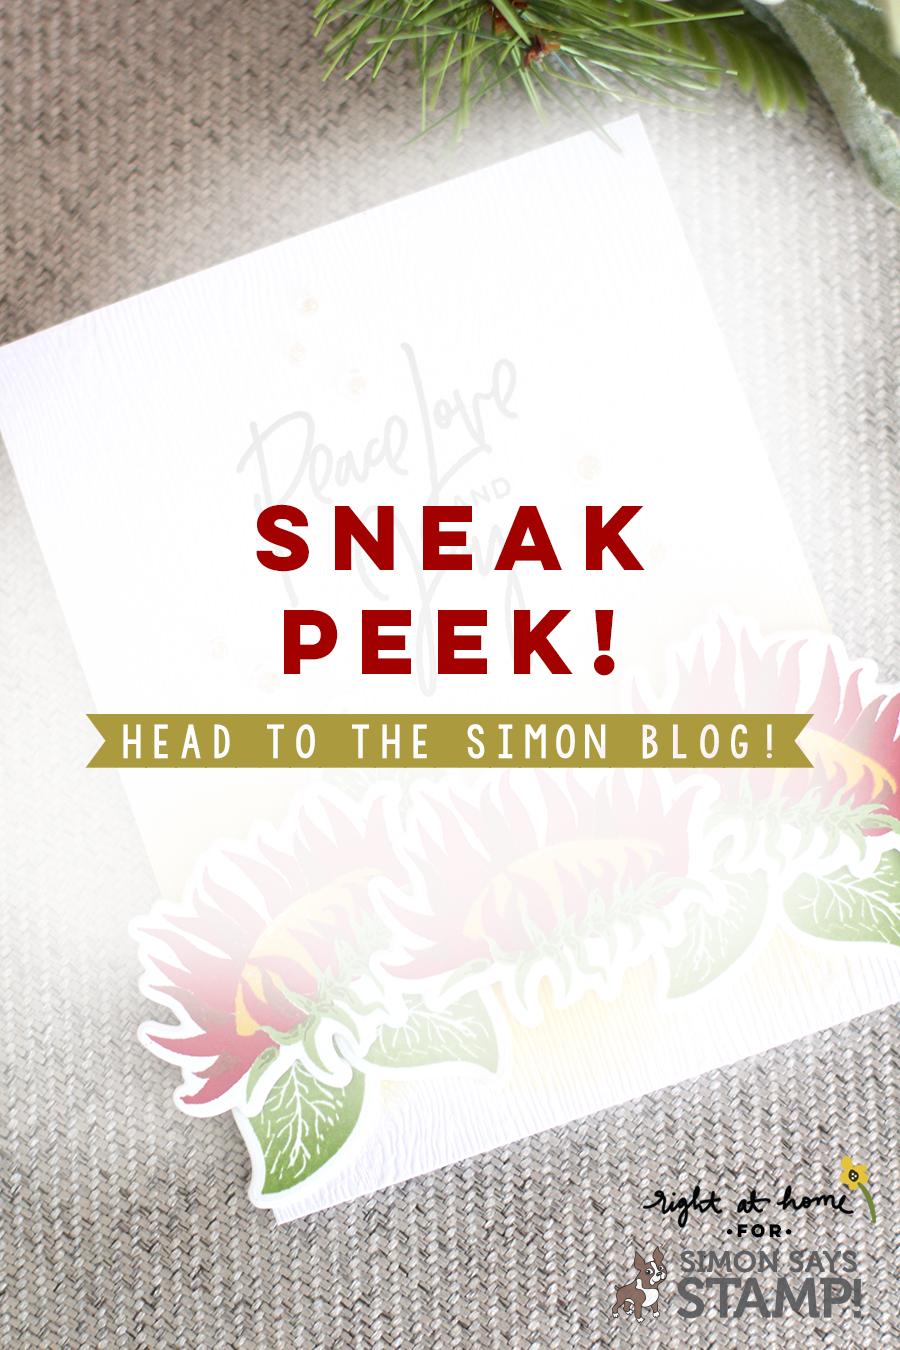 Right at Home for Simon Says Stamp Sneak Peek // Head to www.simonsaysstampblog.com for the full card!